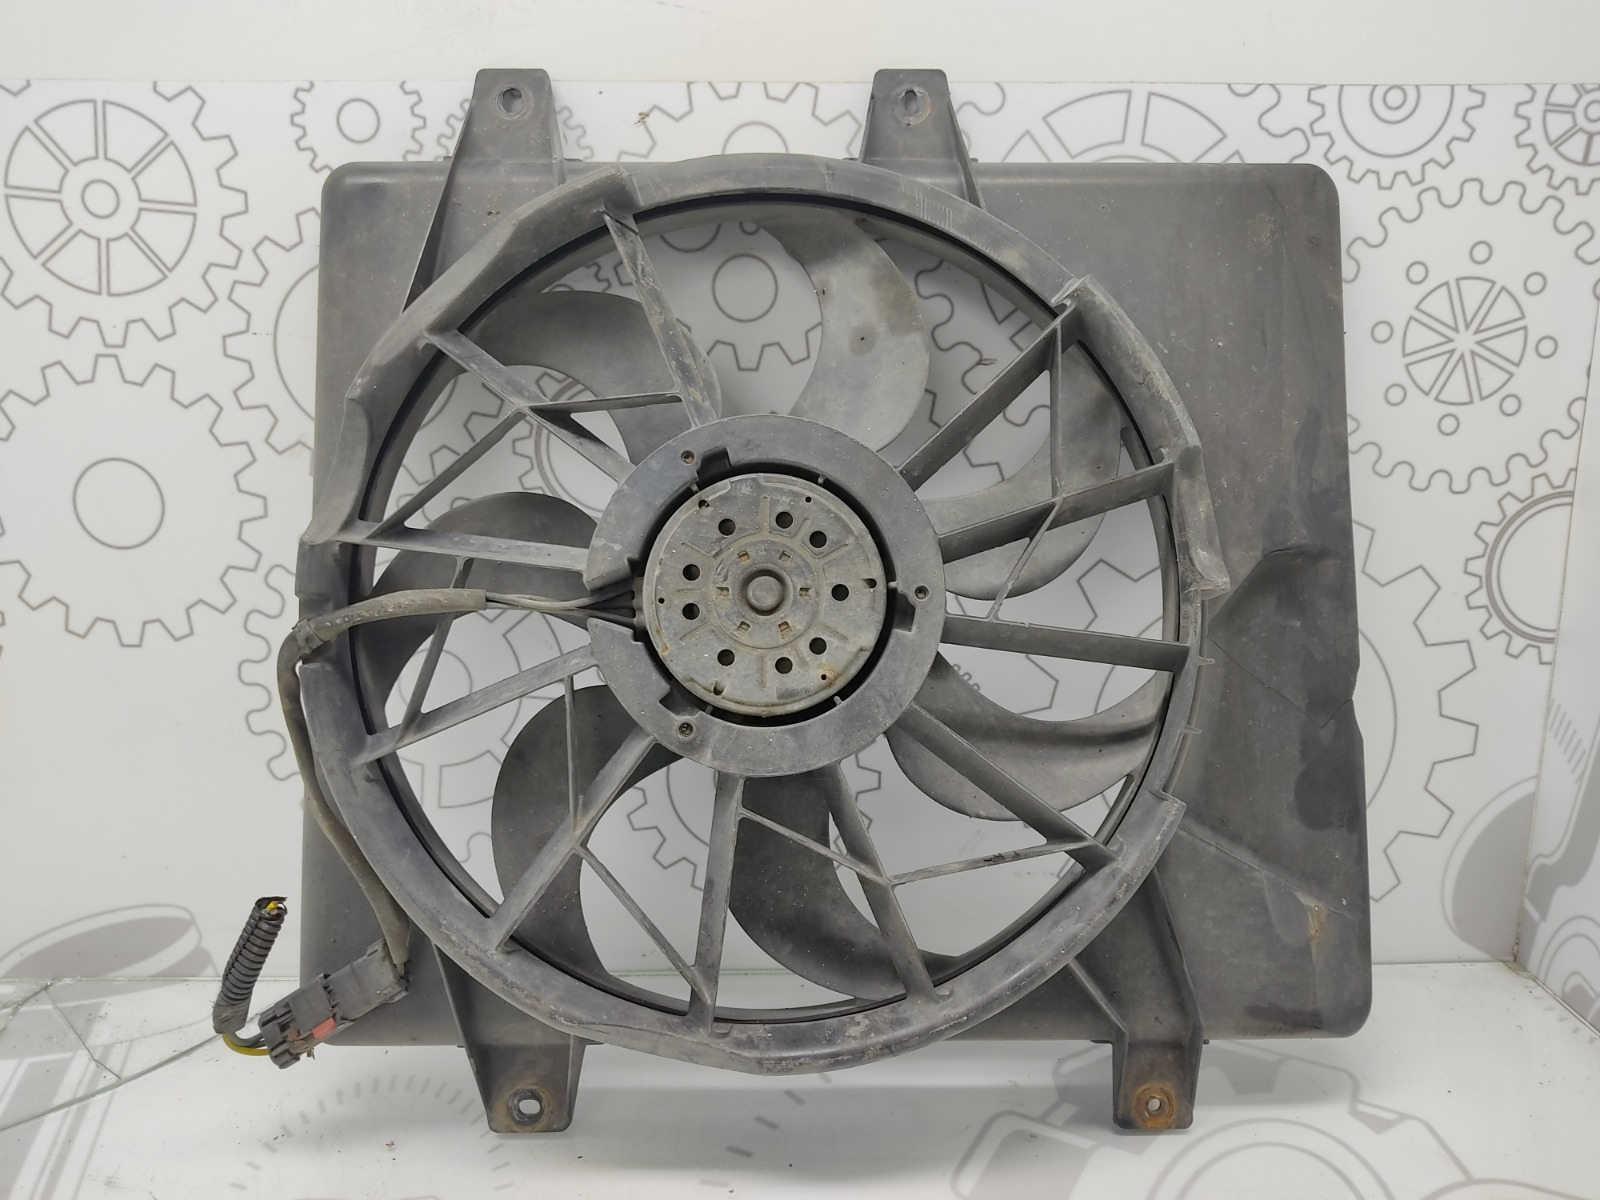 Вентилятор радиатора Chrysler Pt-Cruiser 2.2 CRD 2003 (б/у)